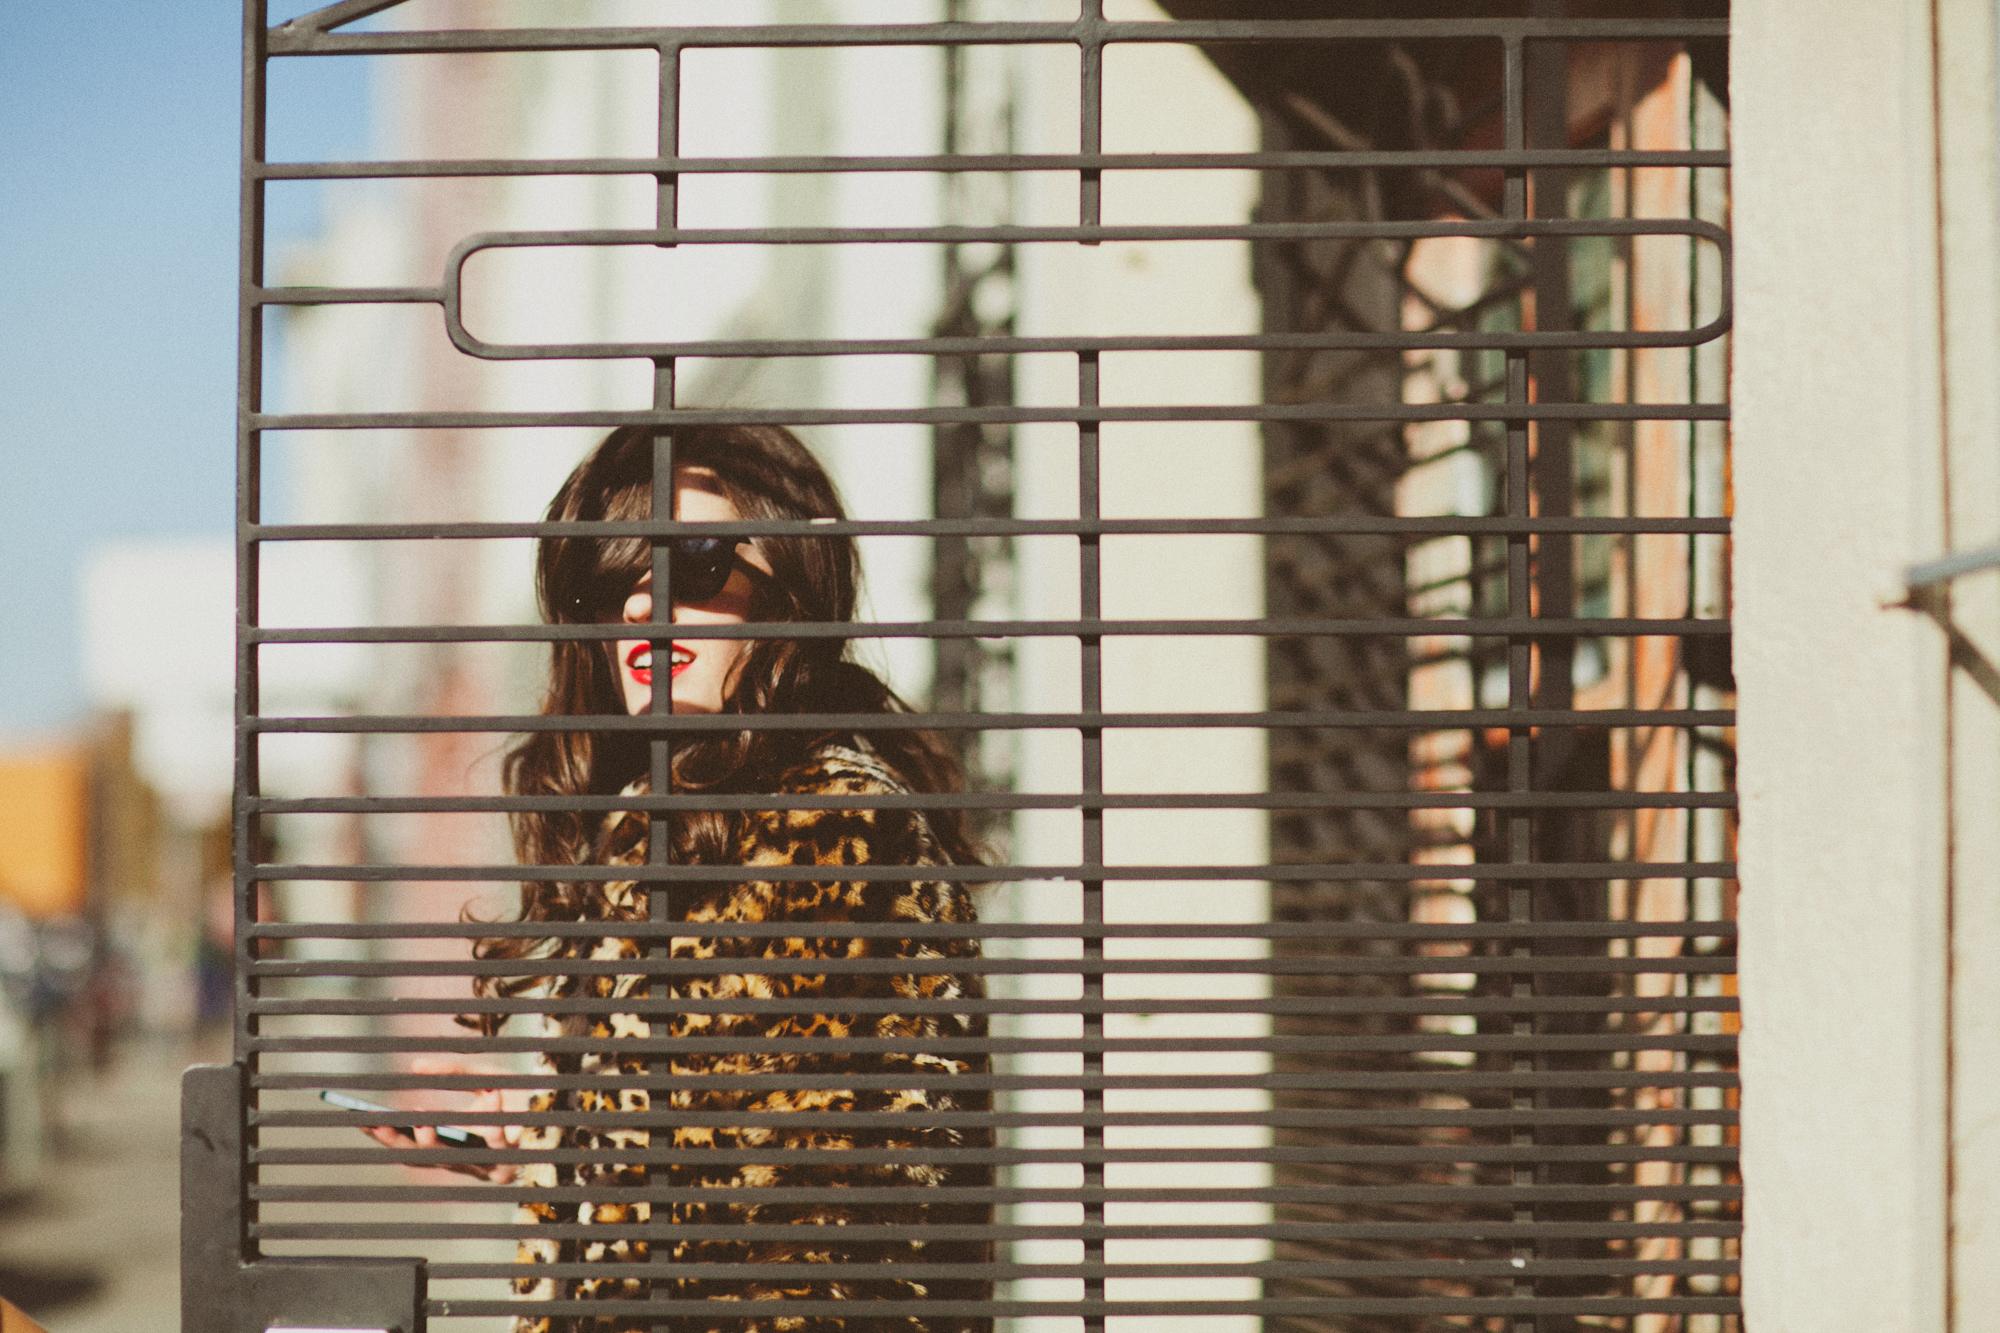 Music & Fashion Photographer Jennifer Skog photographs indie-electronic pop duo CATHEDRALS